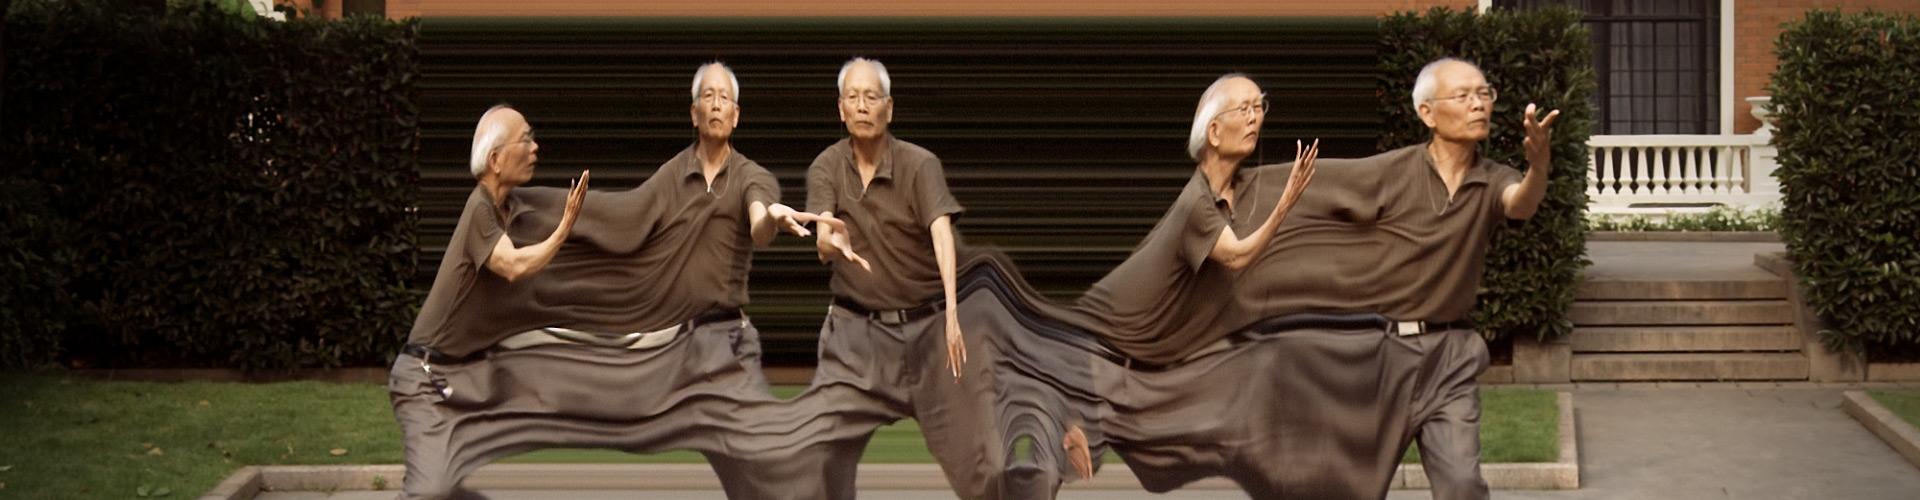 Daniel Crooks Motion Studies image